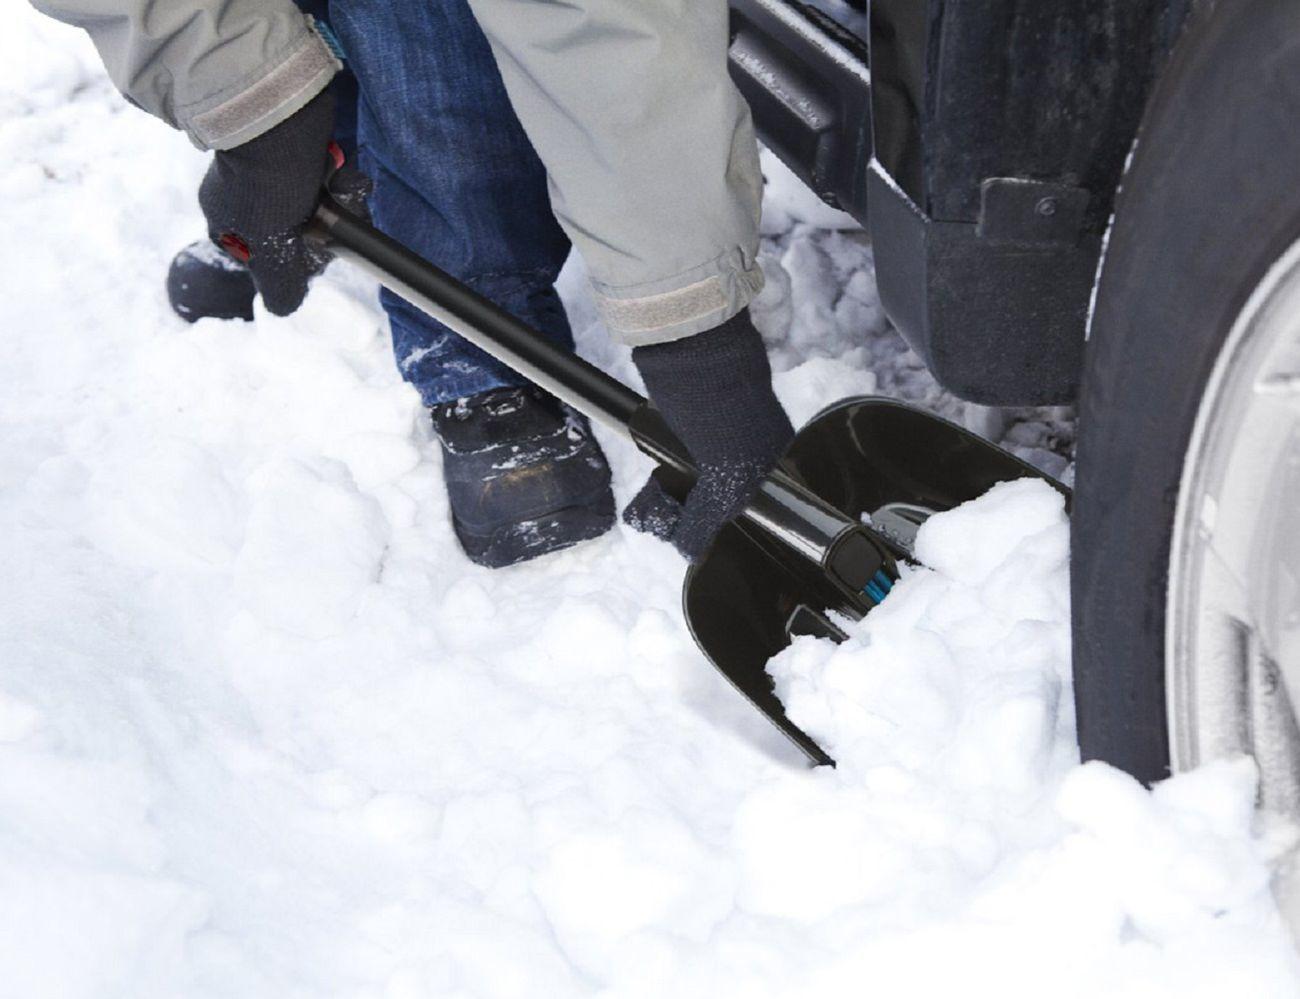 Zeus+Snow+Shovel+And+Brush